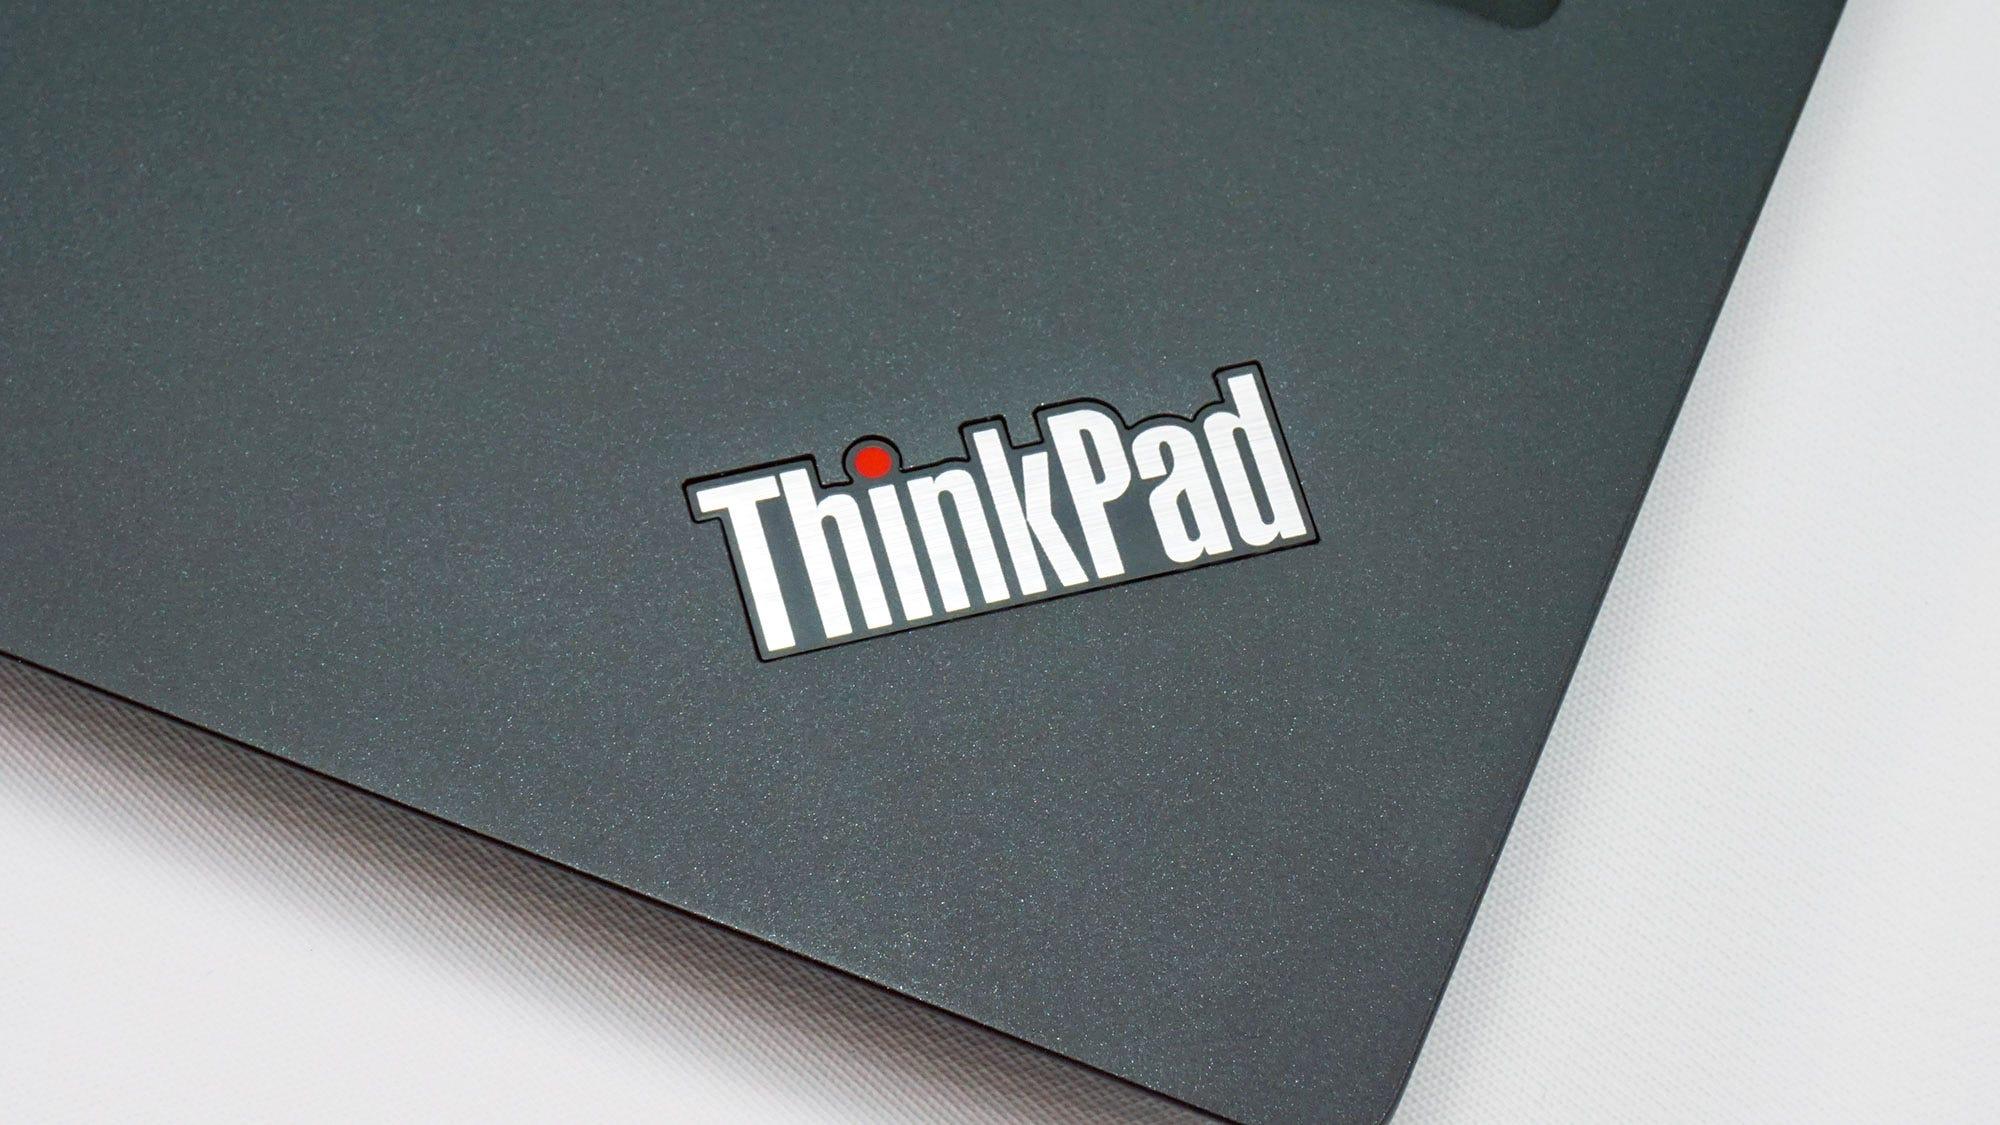 The ThinkPad logo on the T490s.